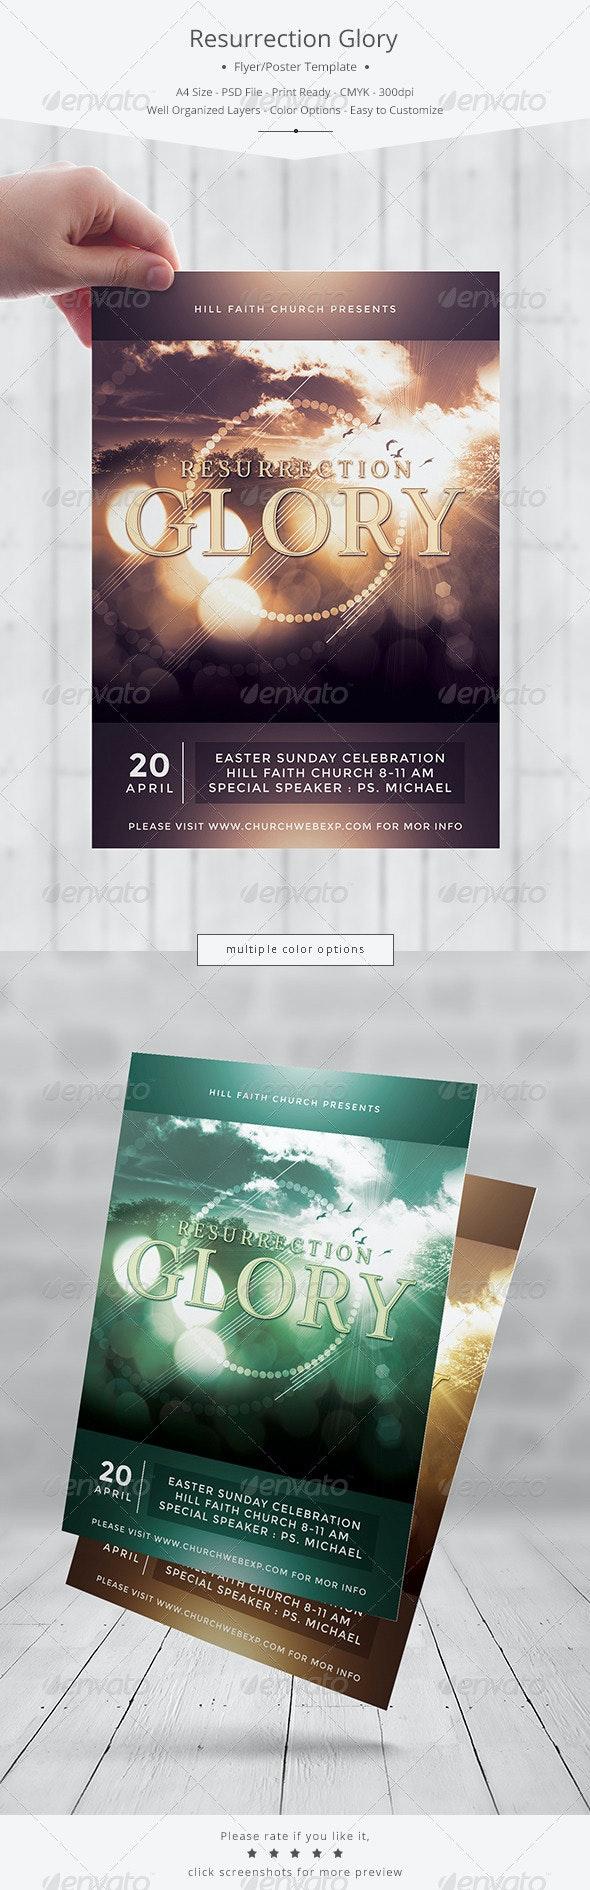 Resurrection Glory Flyer/Poster Template - Church Flyers